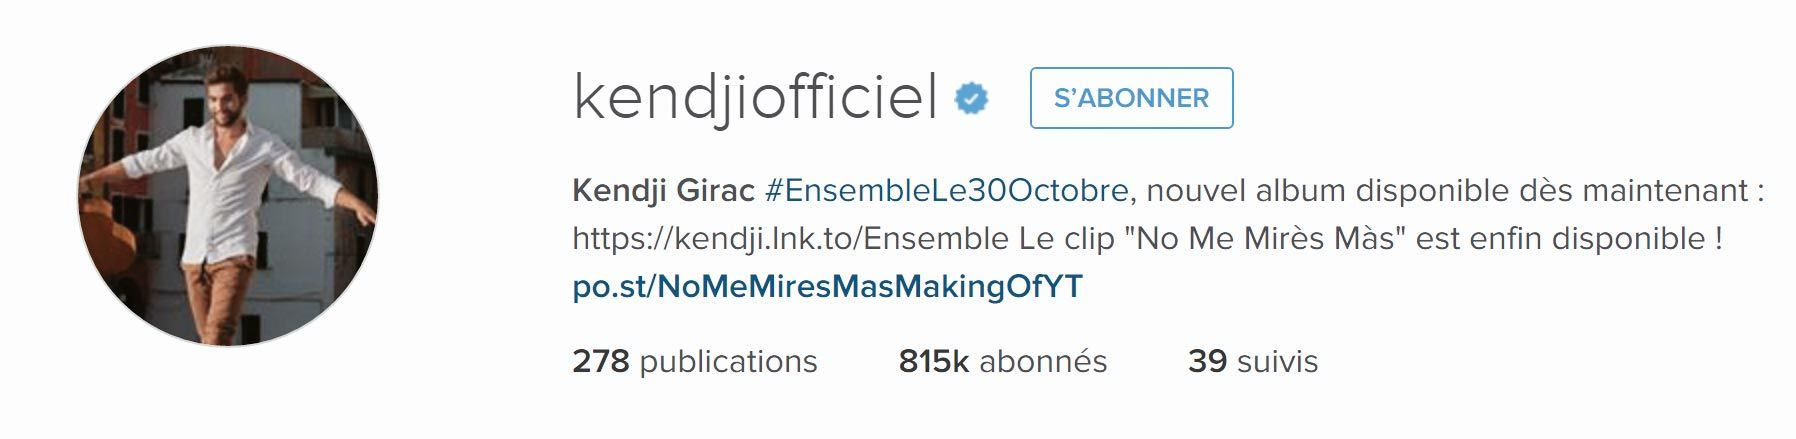 <stamp theme='his-green2'>Doc. 1</stamp> Profil Instagram Kendji Girac